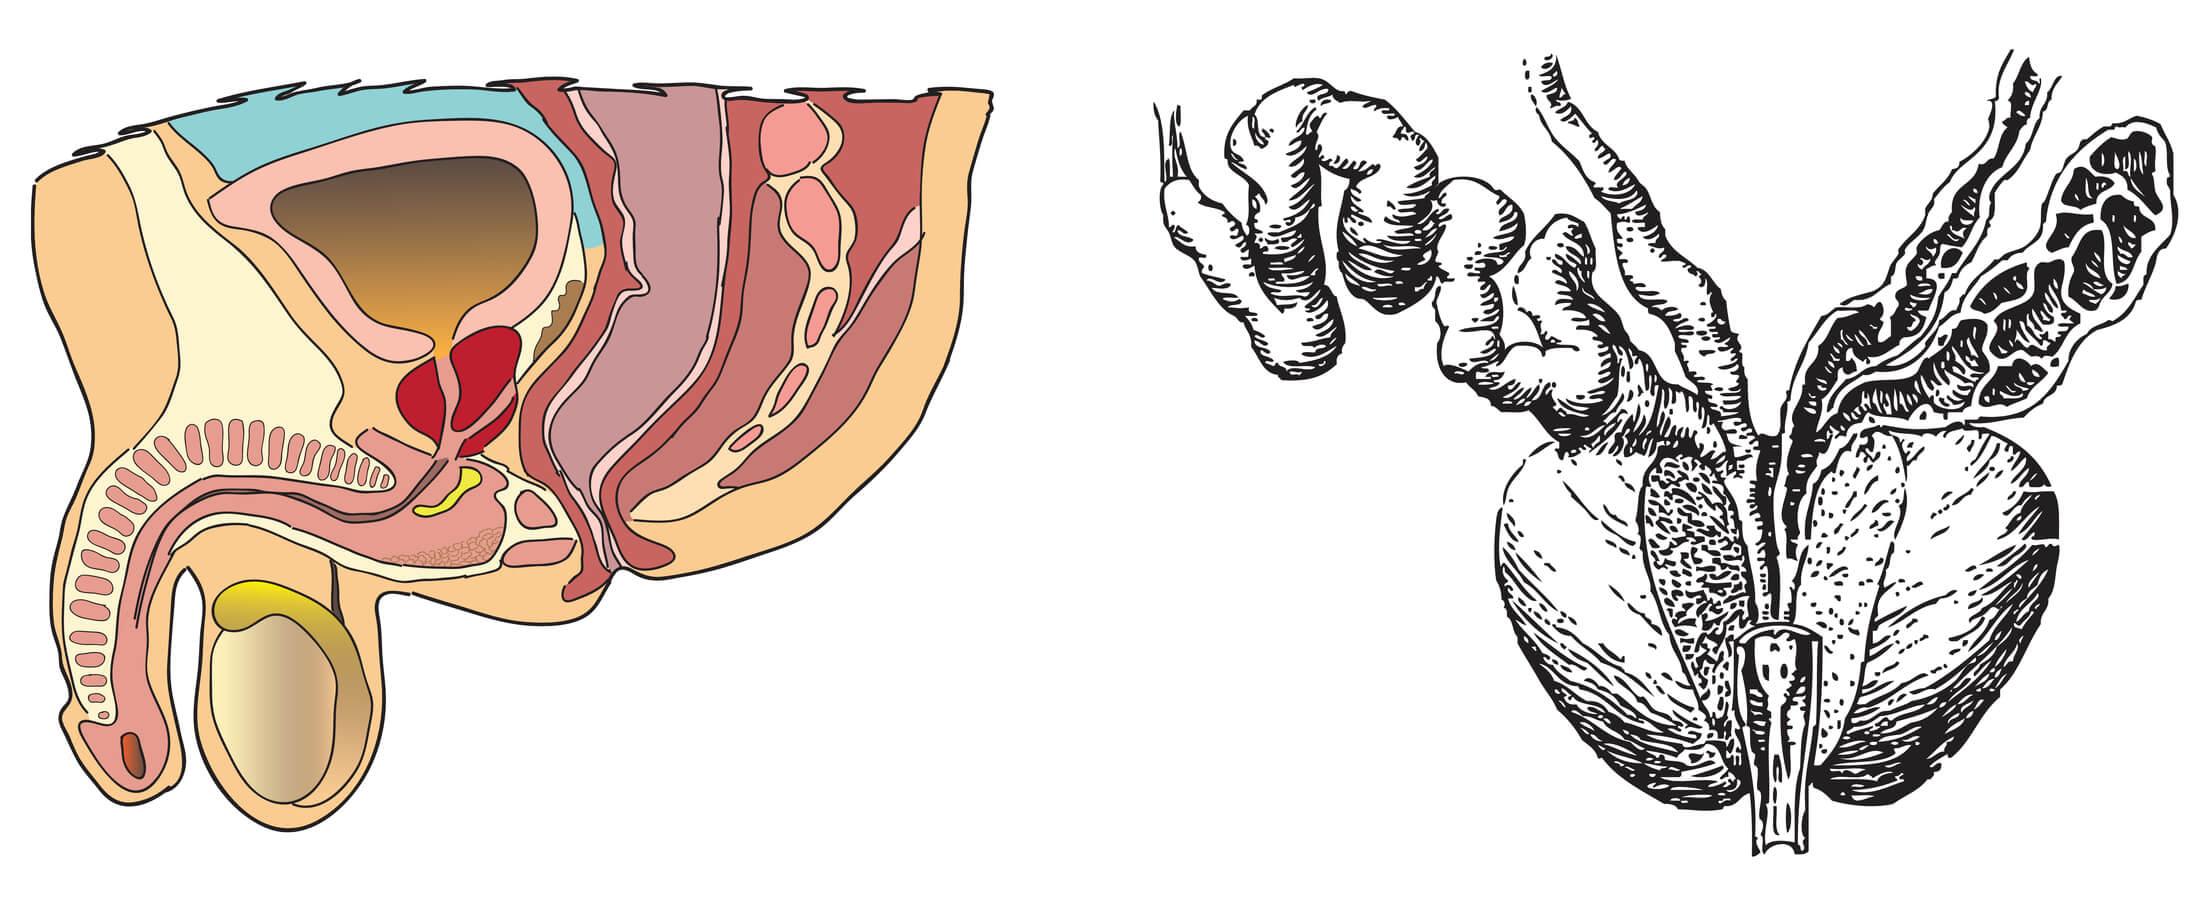 kako izleciti hronicni prostatitis